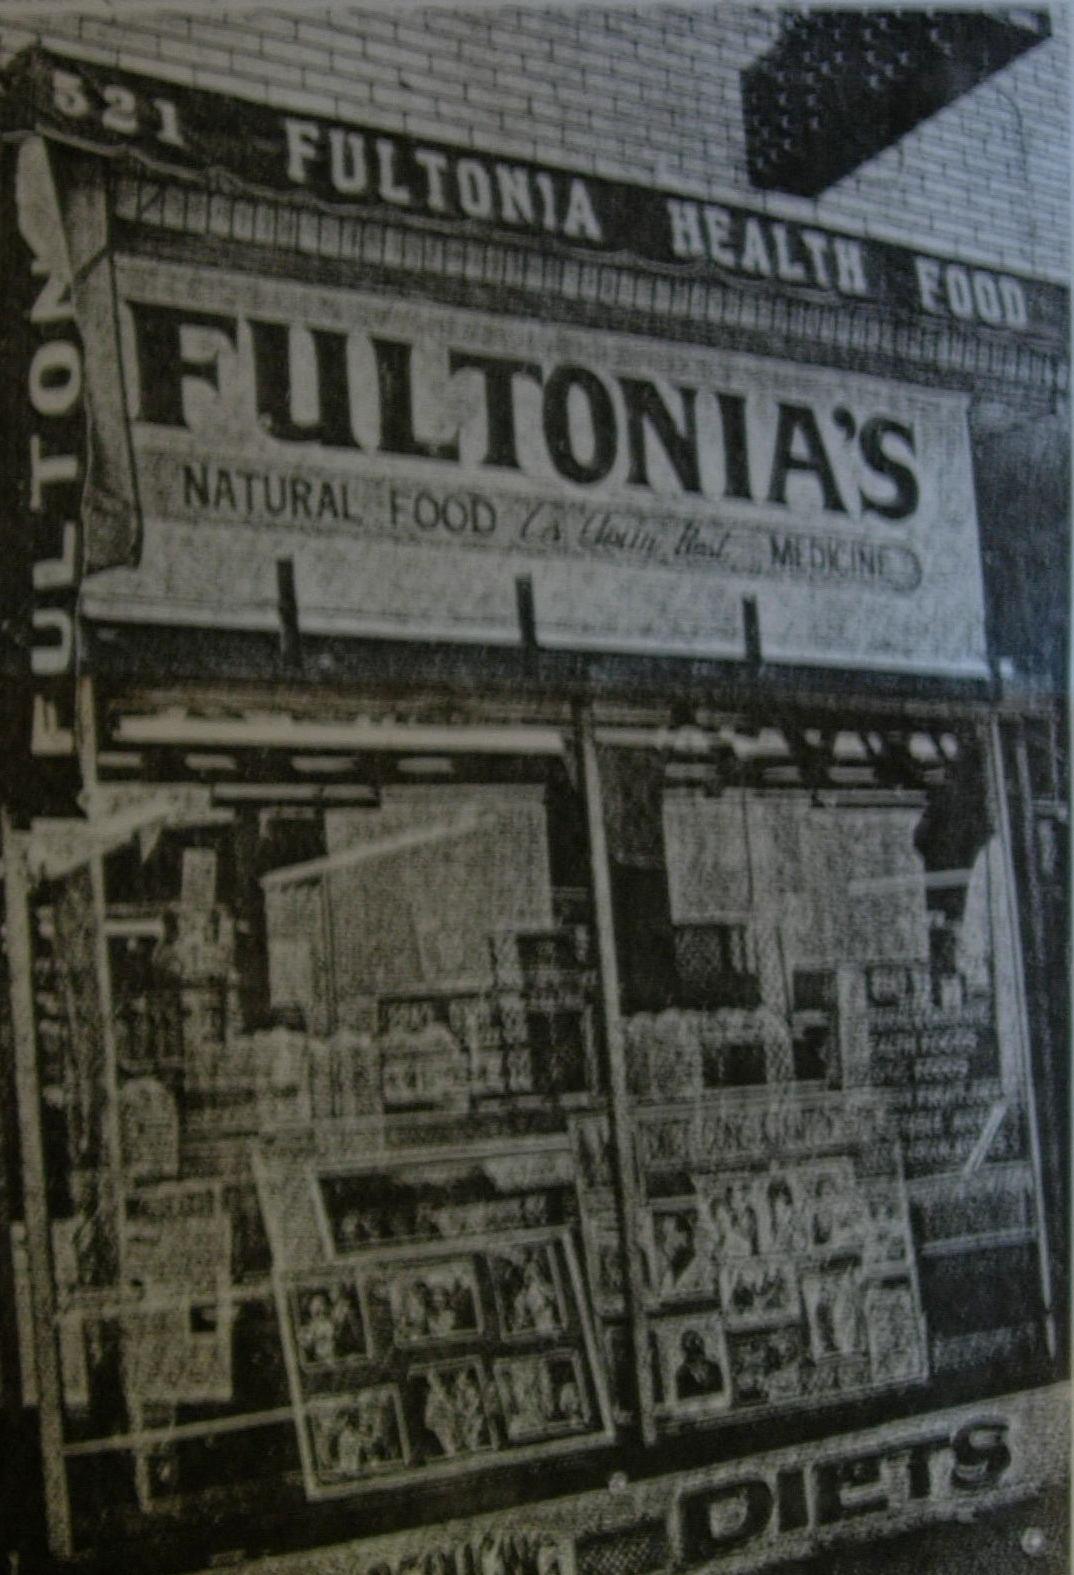 Fultonia's